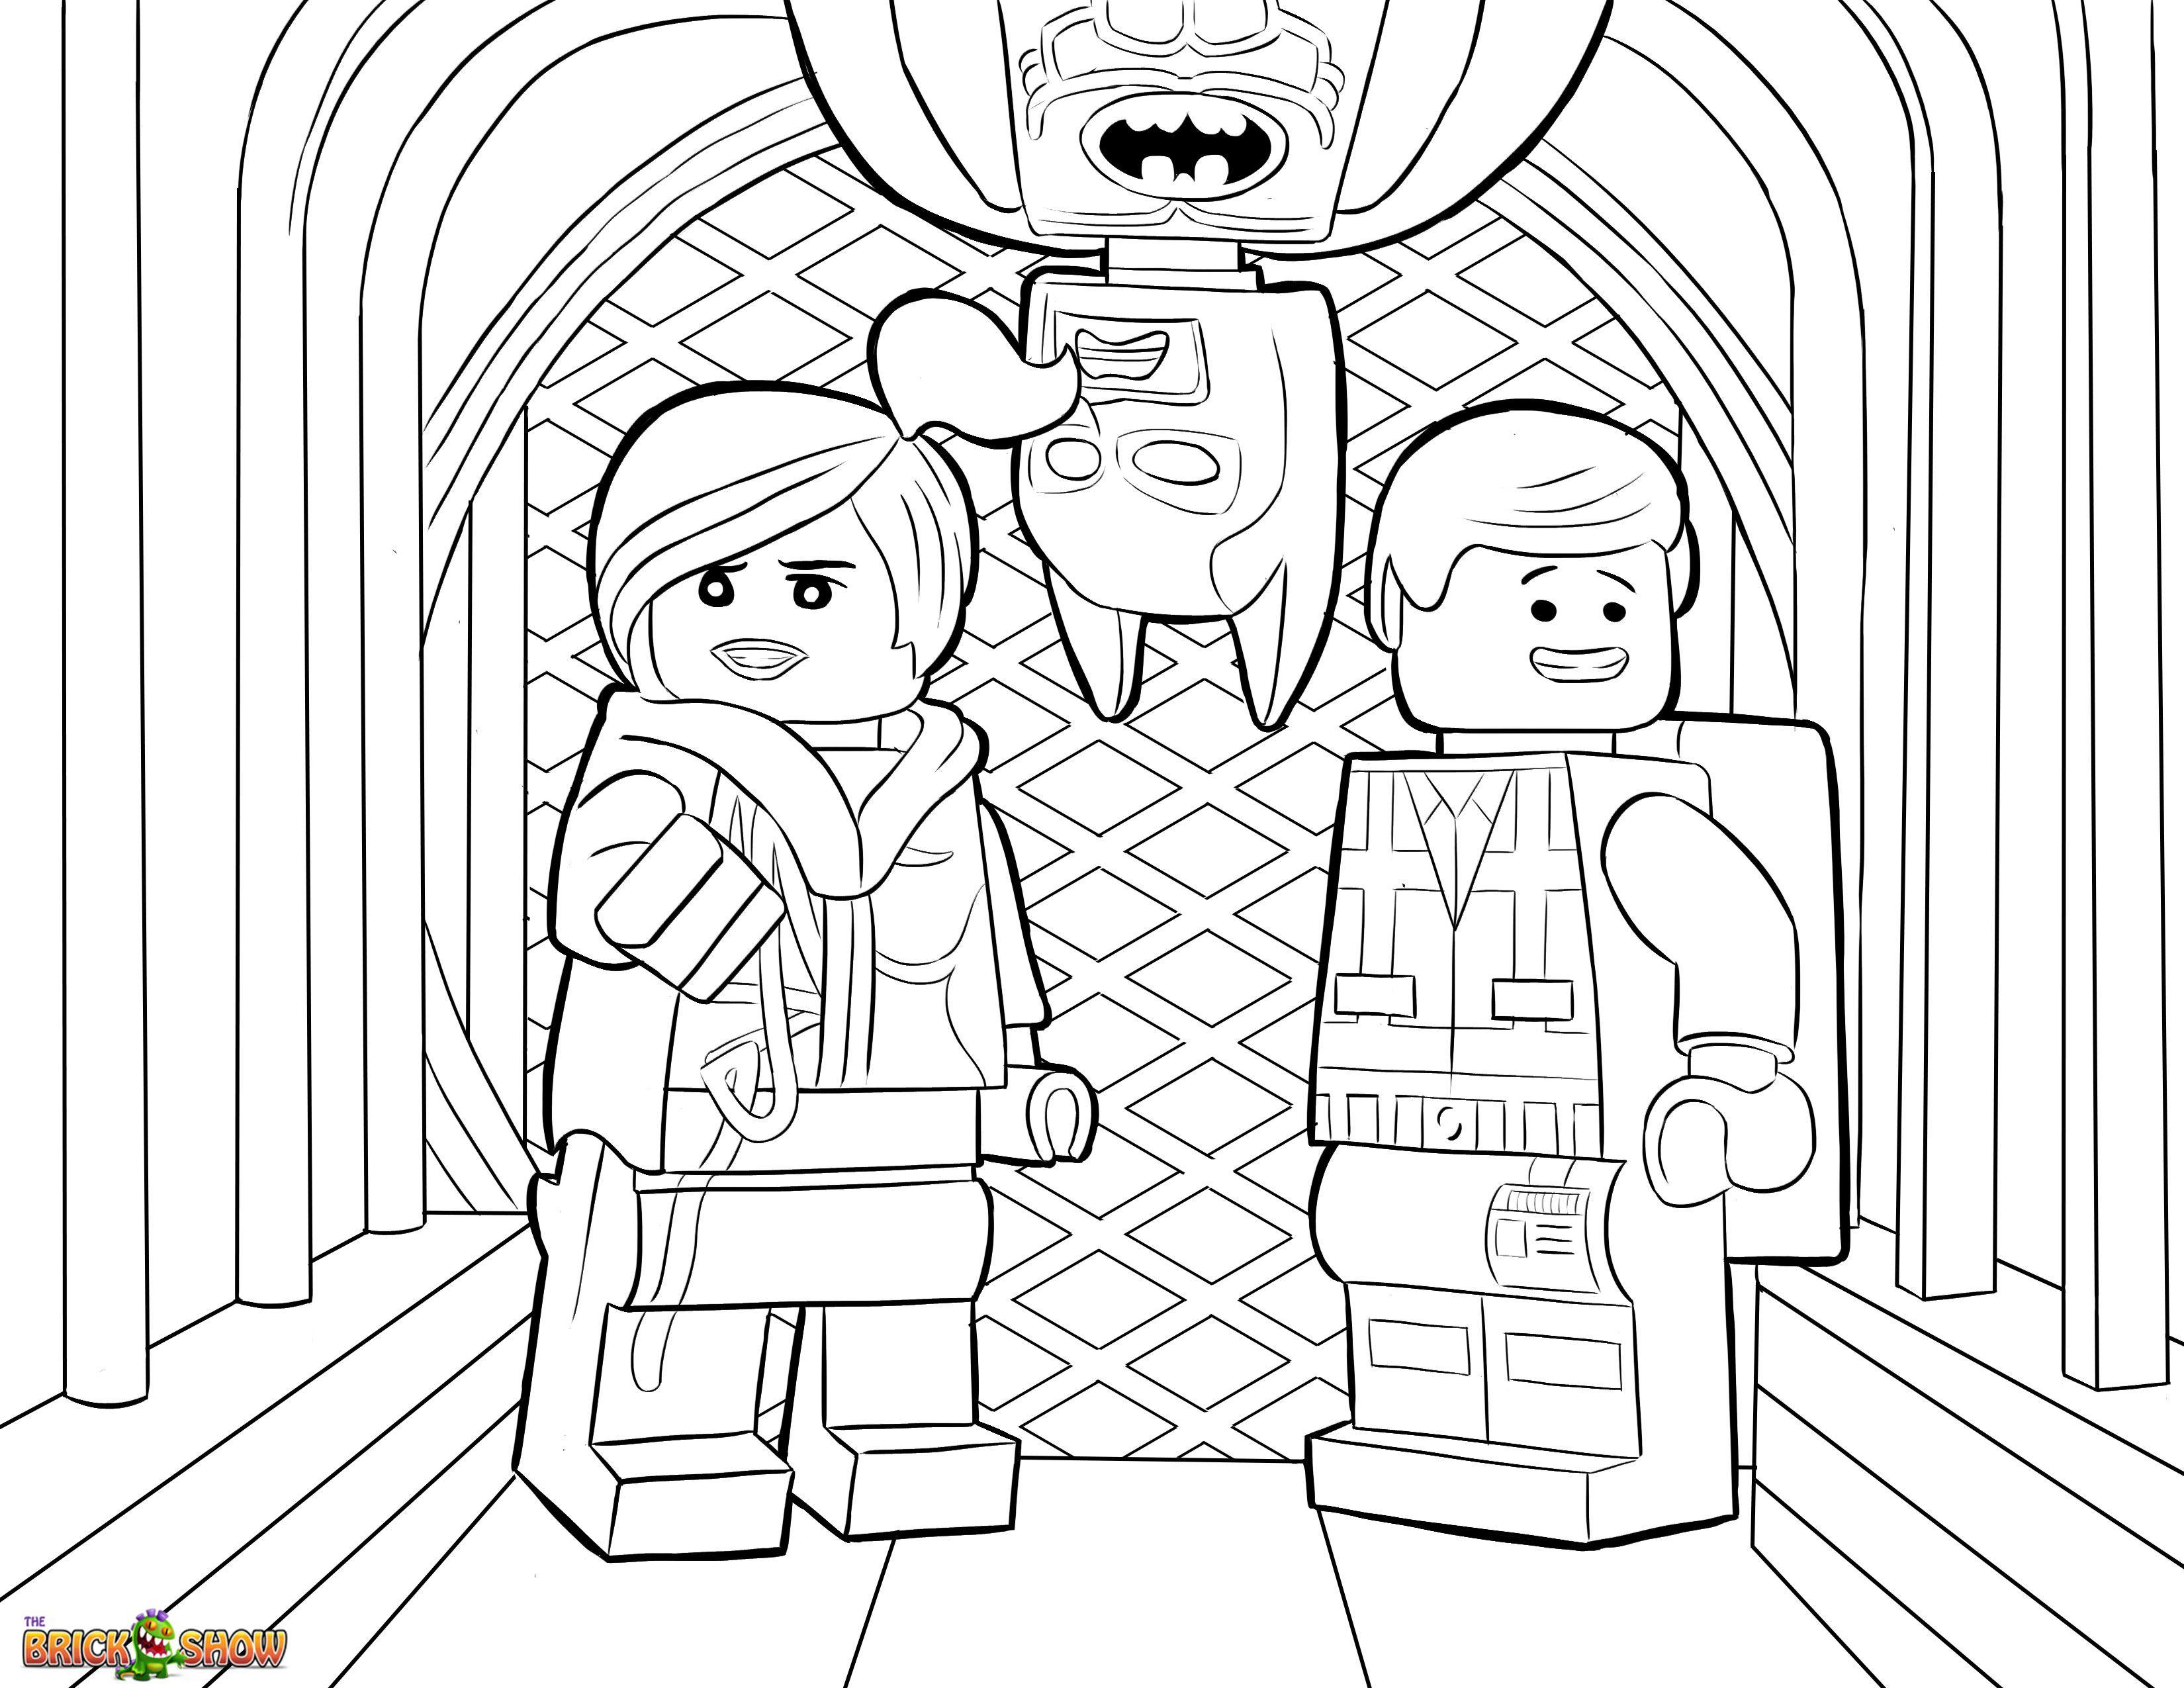 3300x2550 The Lego Movie Coloring Page, Lego Wyldstyle, Emmet Batman